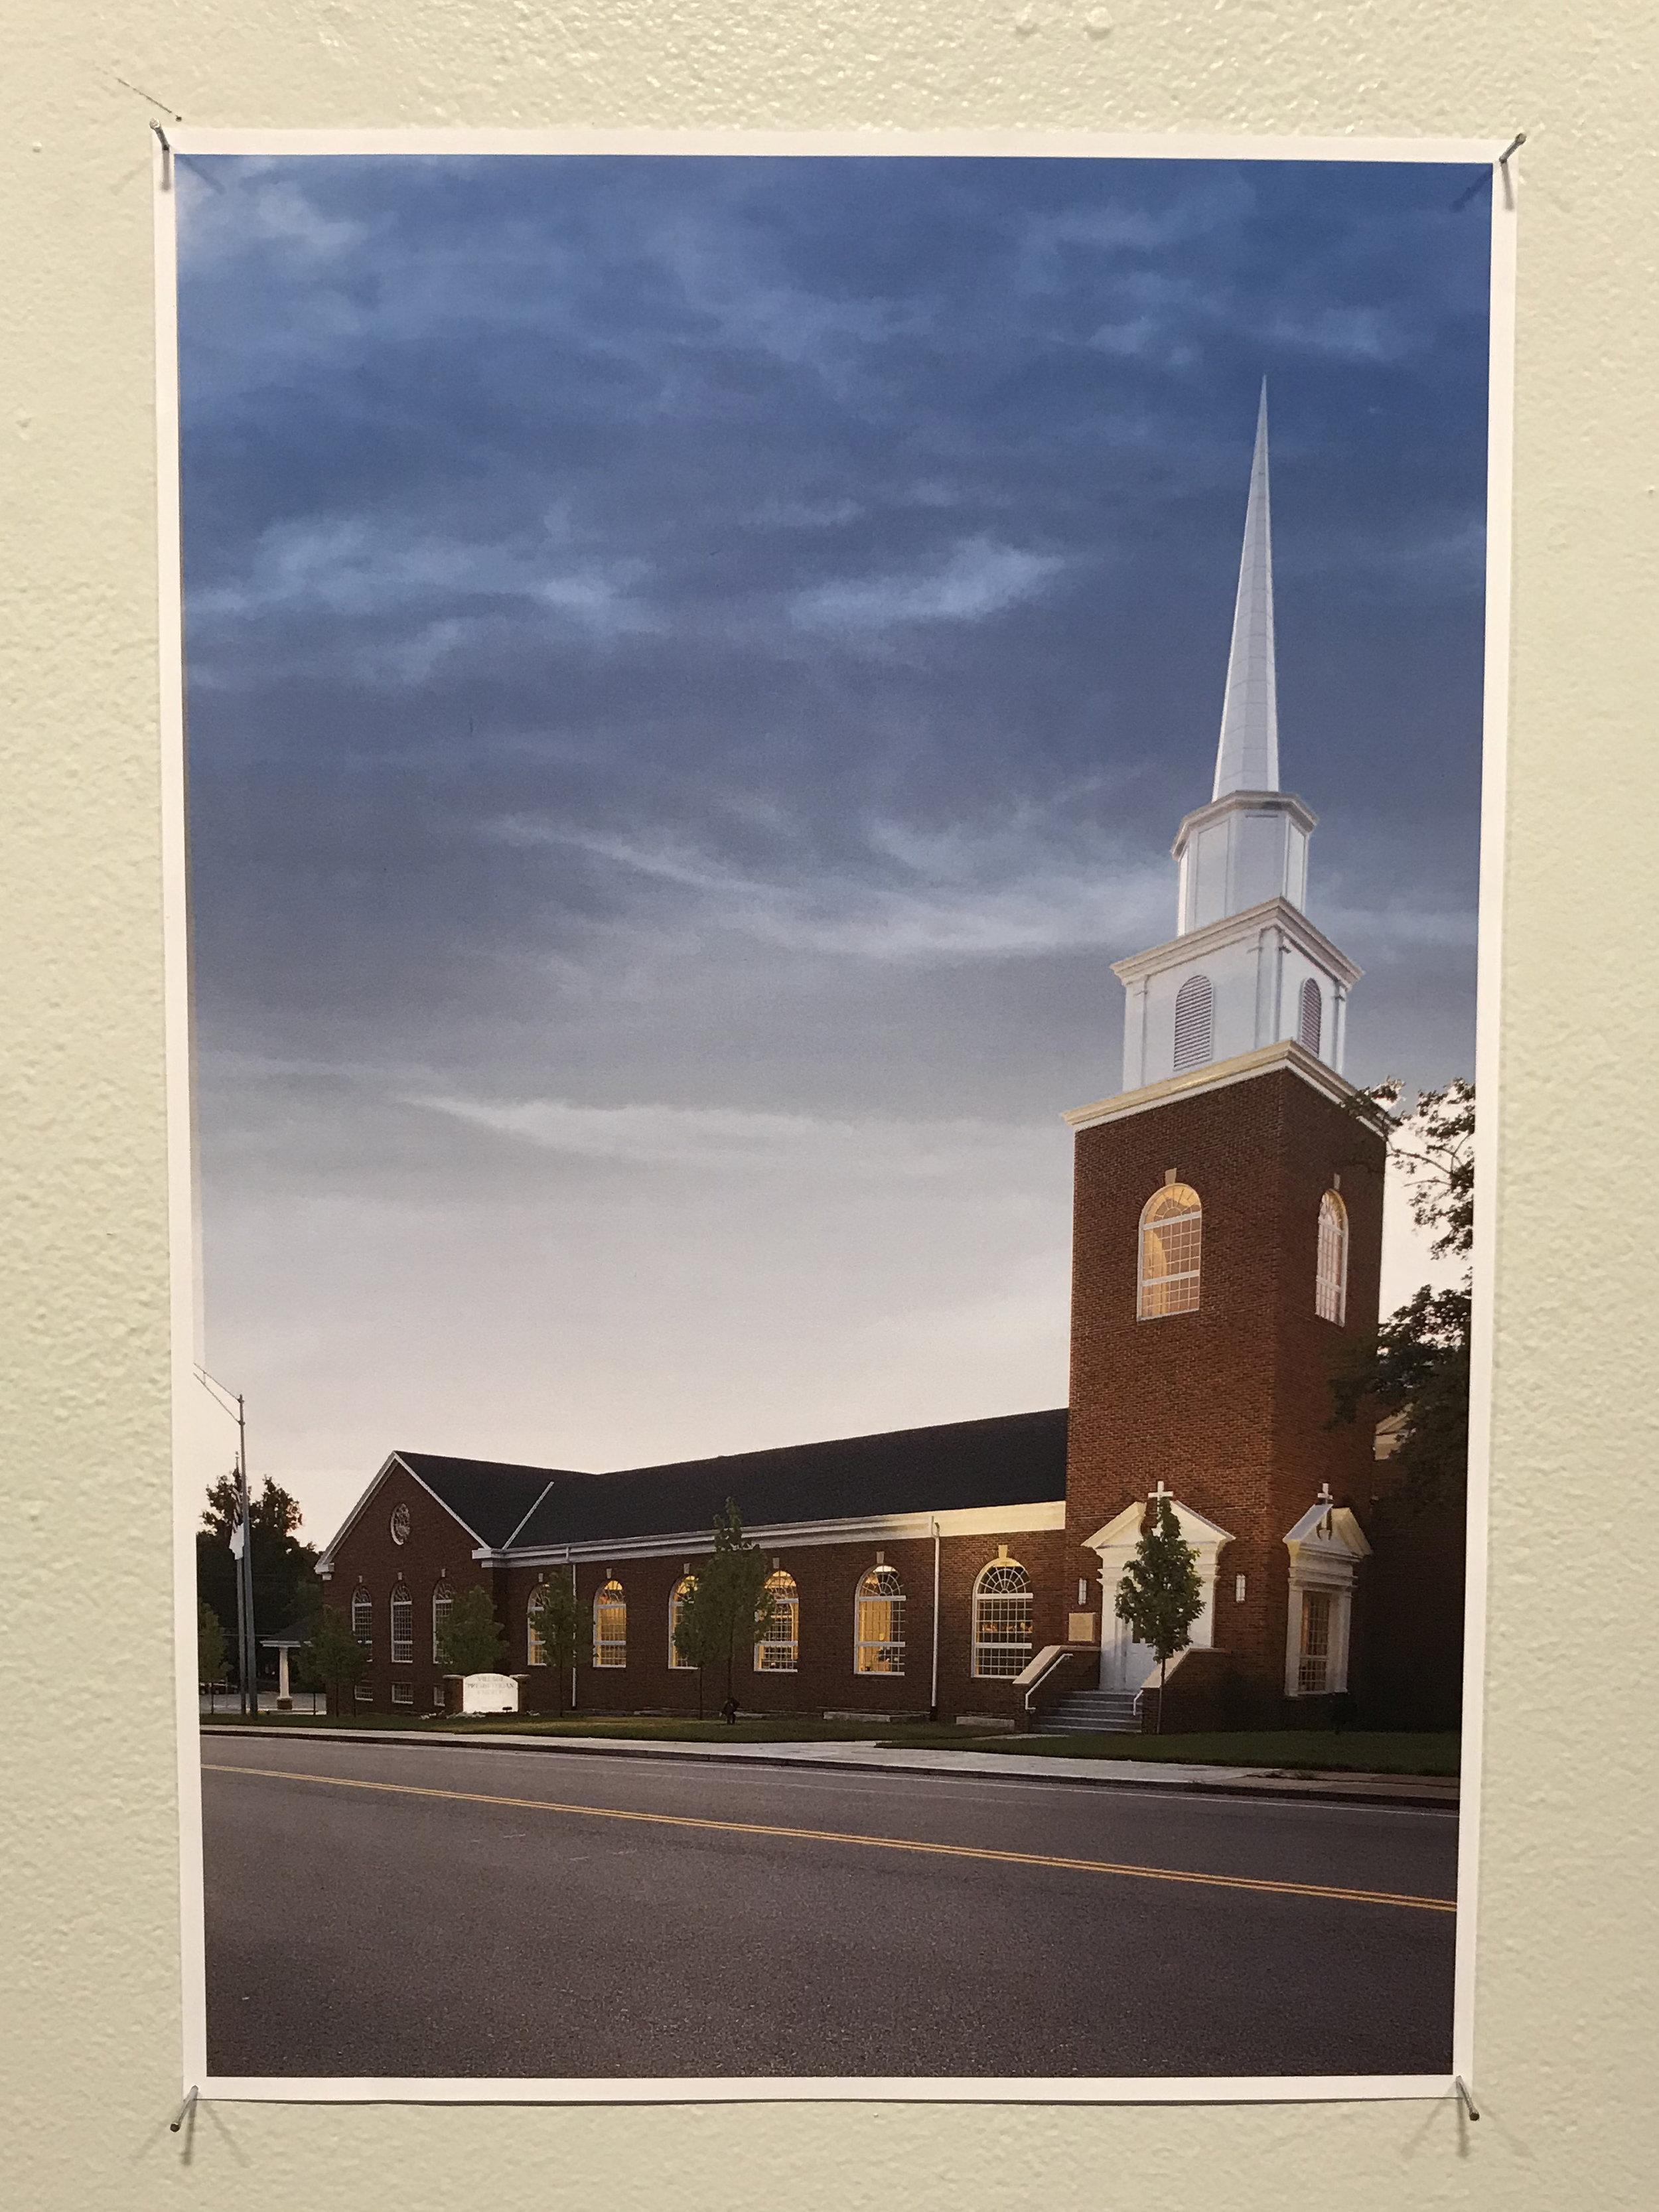 Village Church, Brian Rathsam, Project Architect